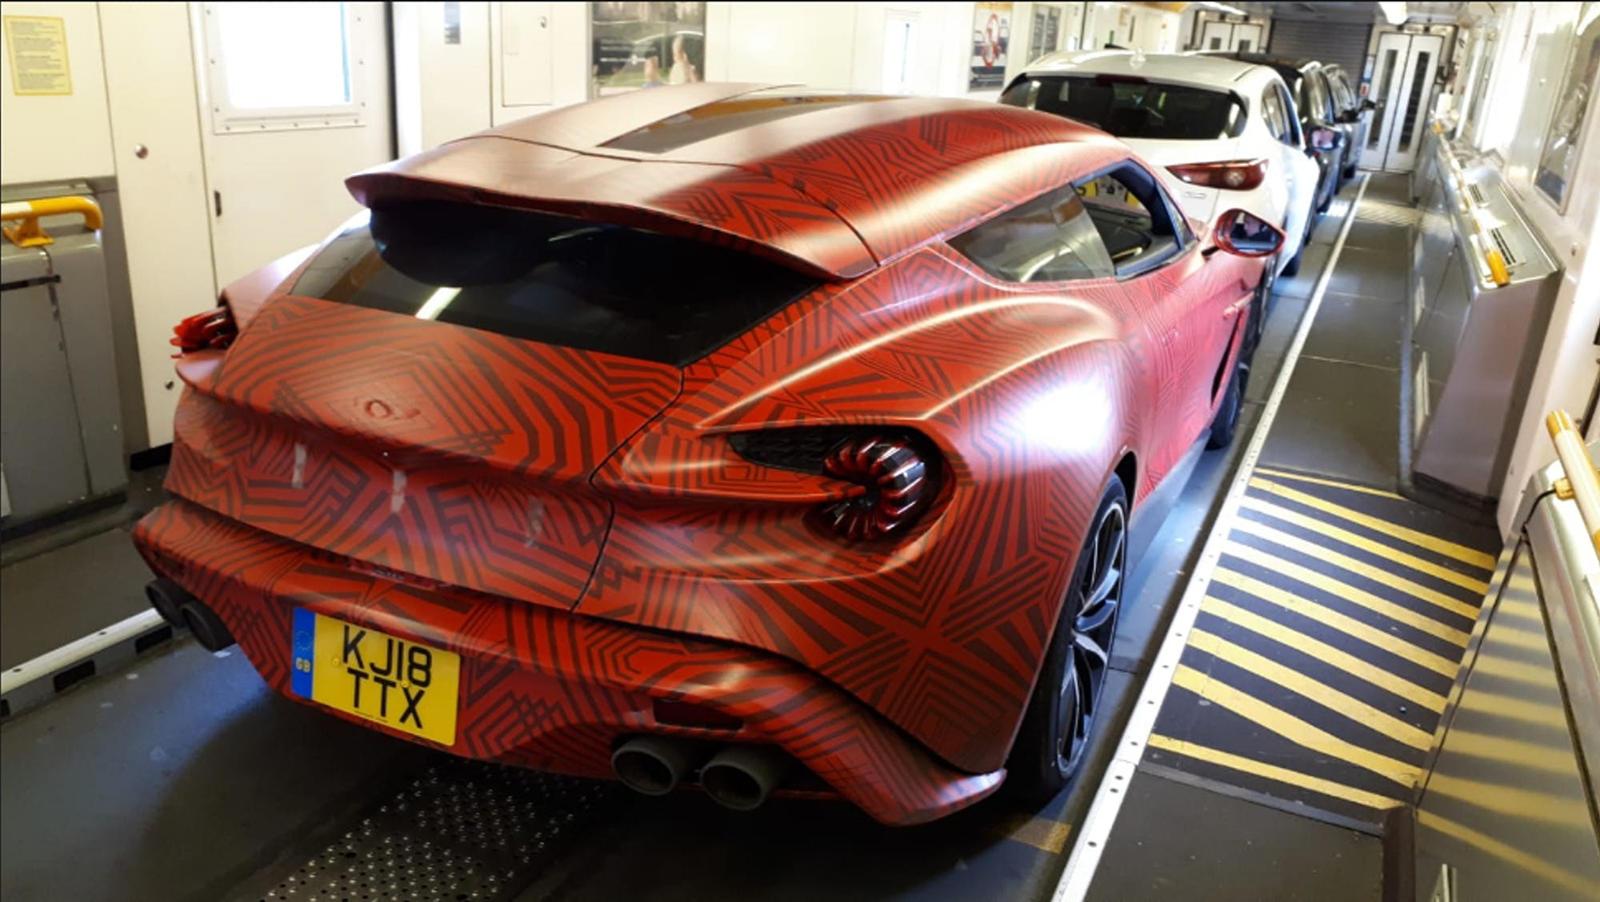 Aston Martin Vanquish Zagato Shooting Brake Looks Breathtakingly Beautiful In The Metal - CarBuzz